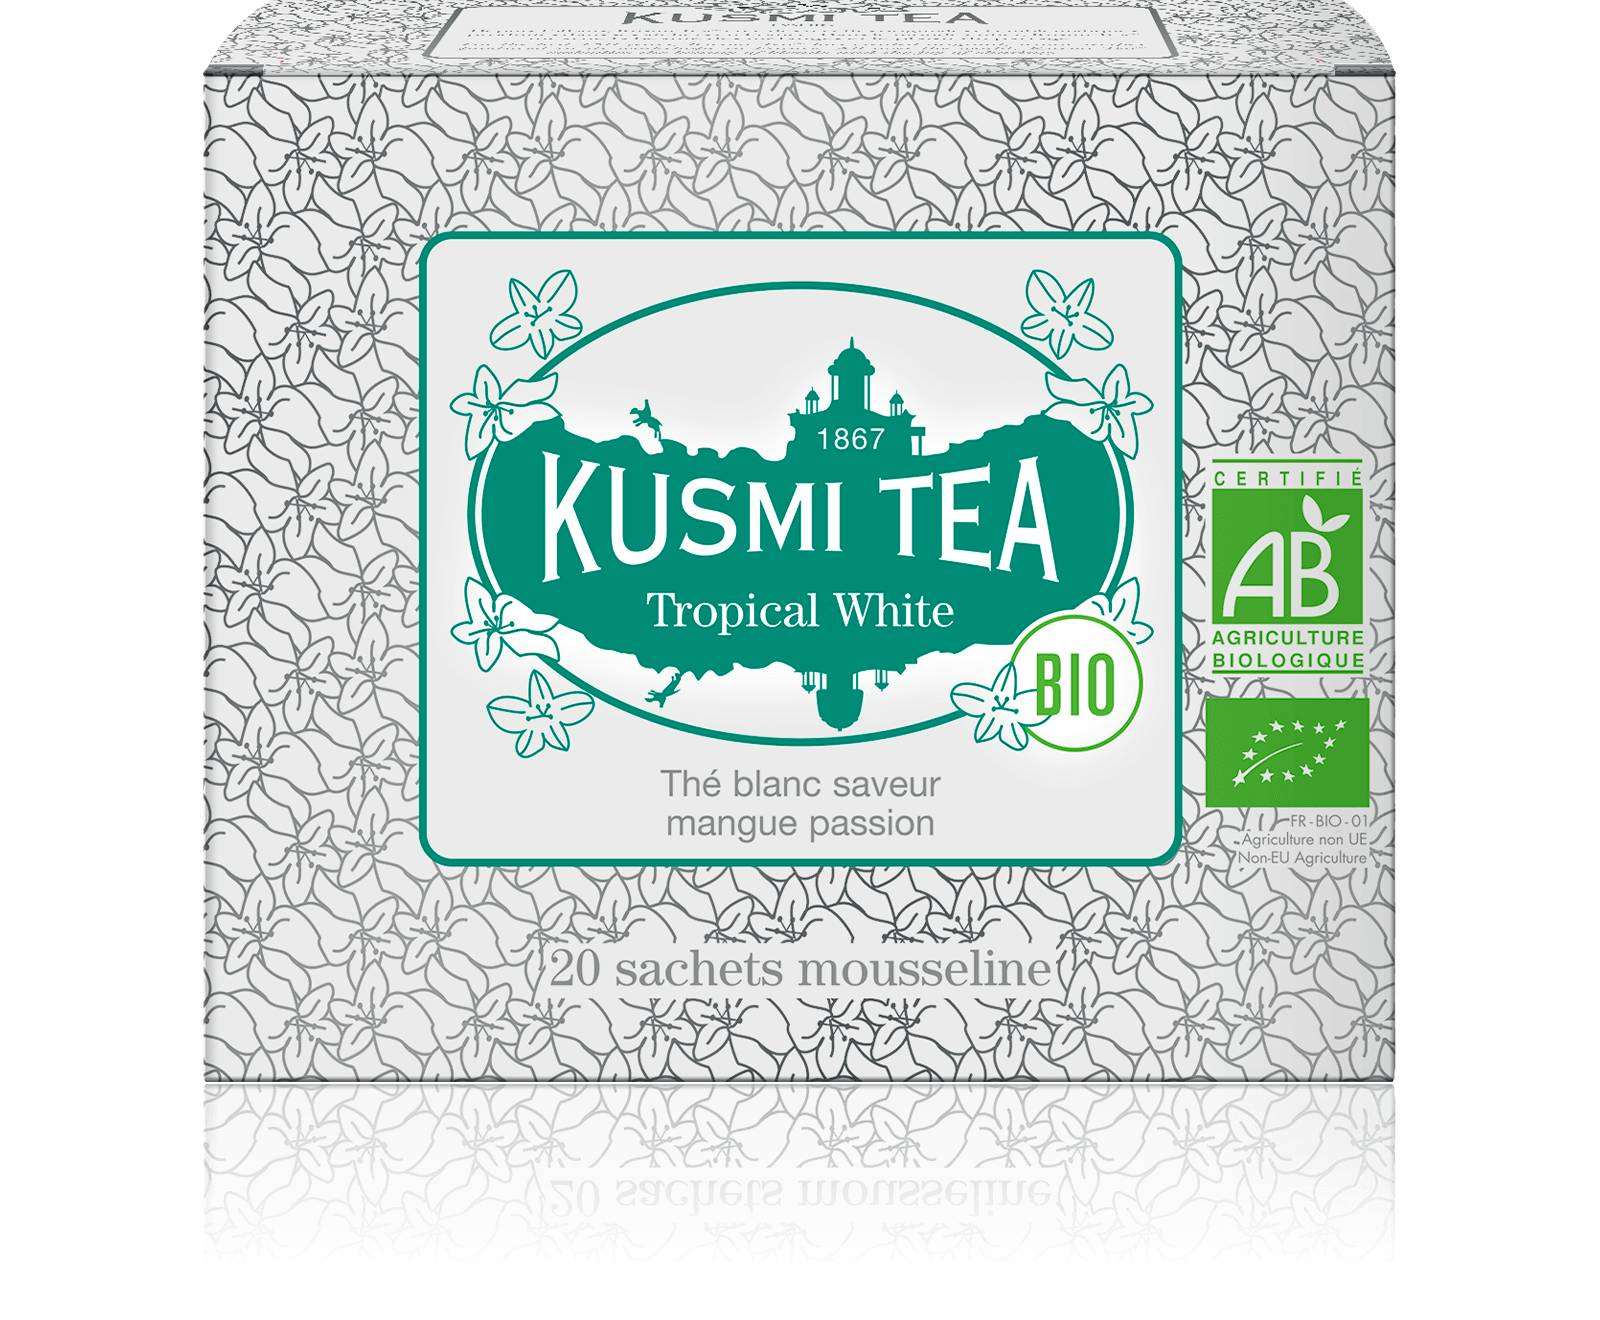 KUSMI TEA Tropical White bio - Thé blanc, mangue, passion - Sachets de thé - Kusmi Tea